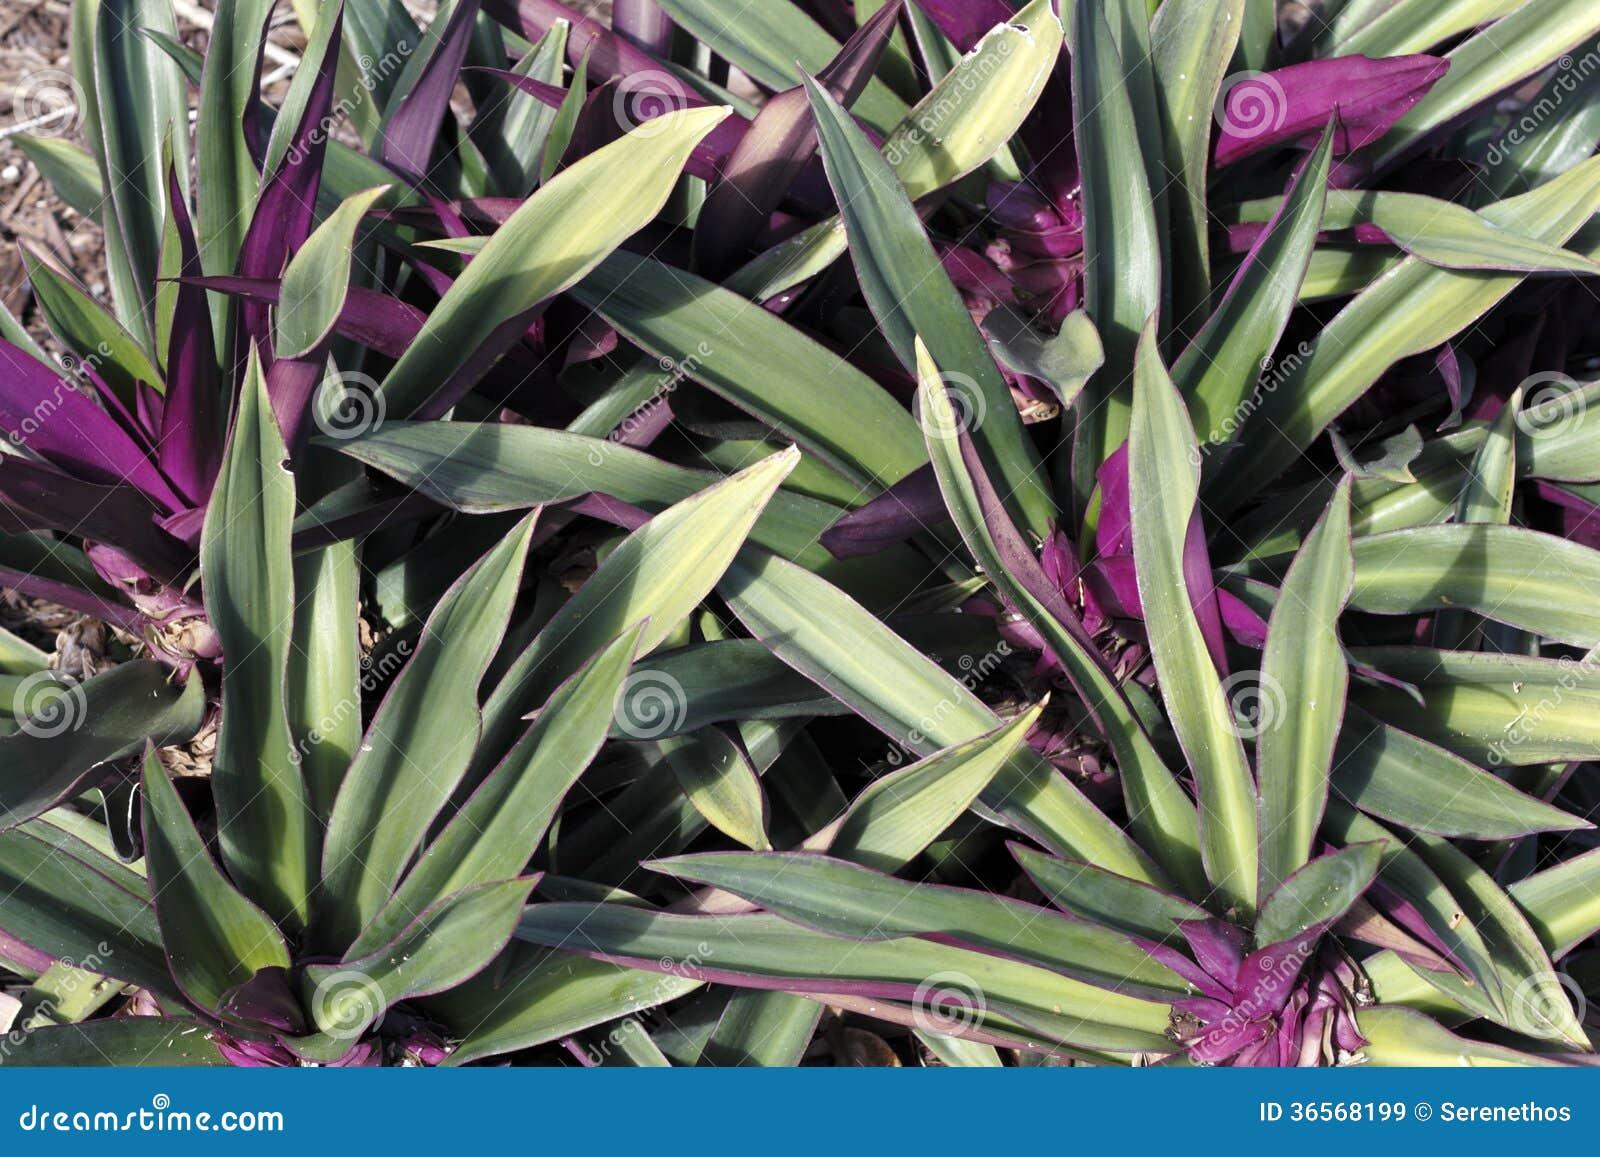 Beautiful Green And Purple Plant Stock Image - Image of foliage, florida: 36568199